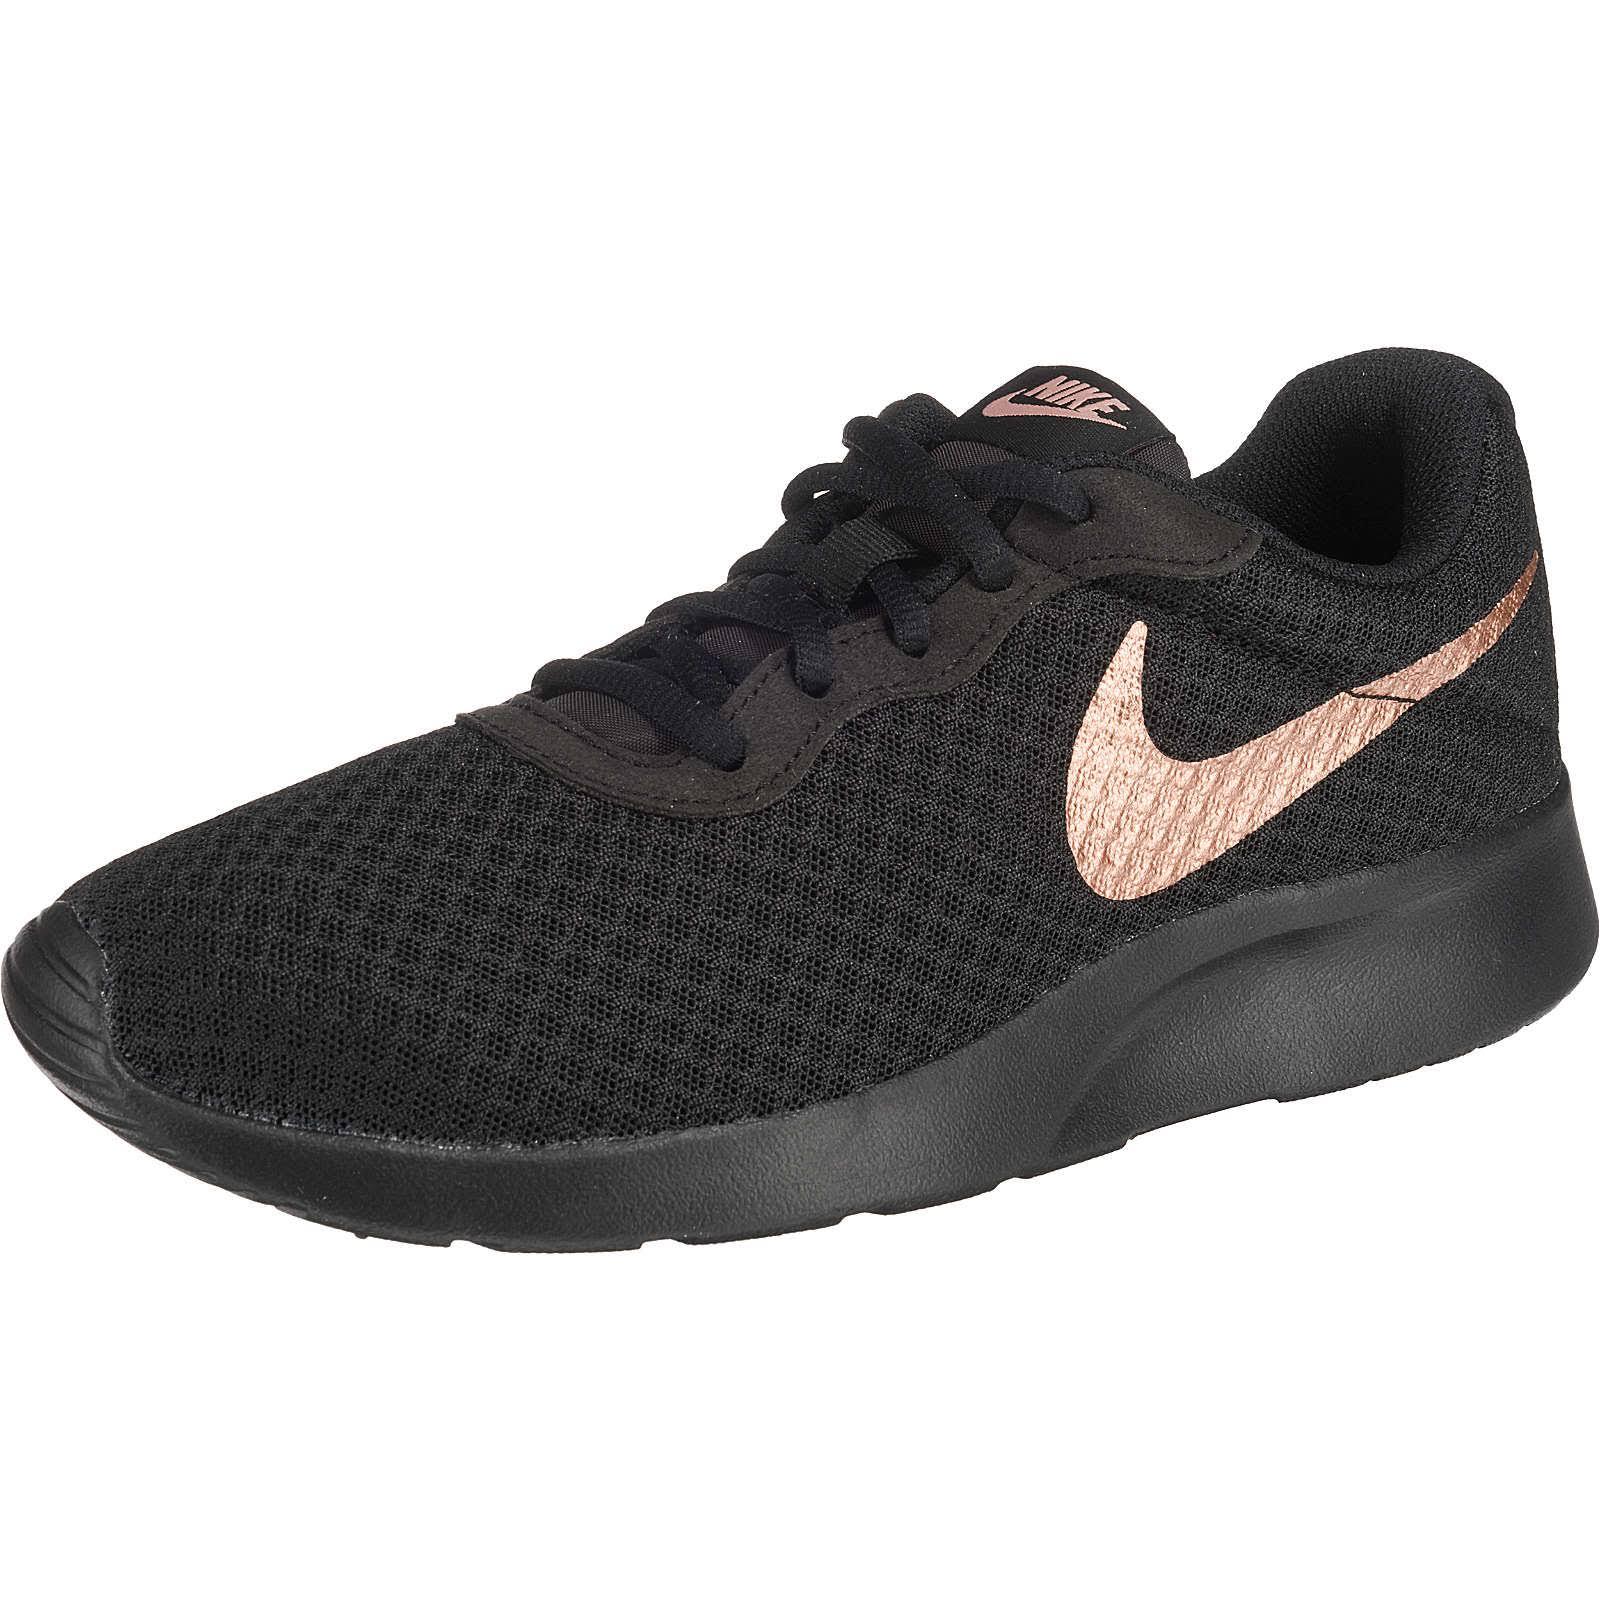 Women Bronze bronzefarben 38 Schwarz Tanjun Schuh mtlc Black 812655 Red Nike TZ1WqSRq